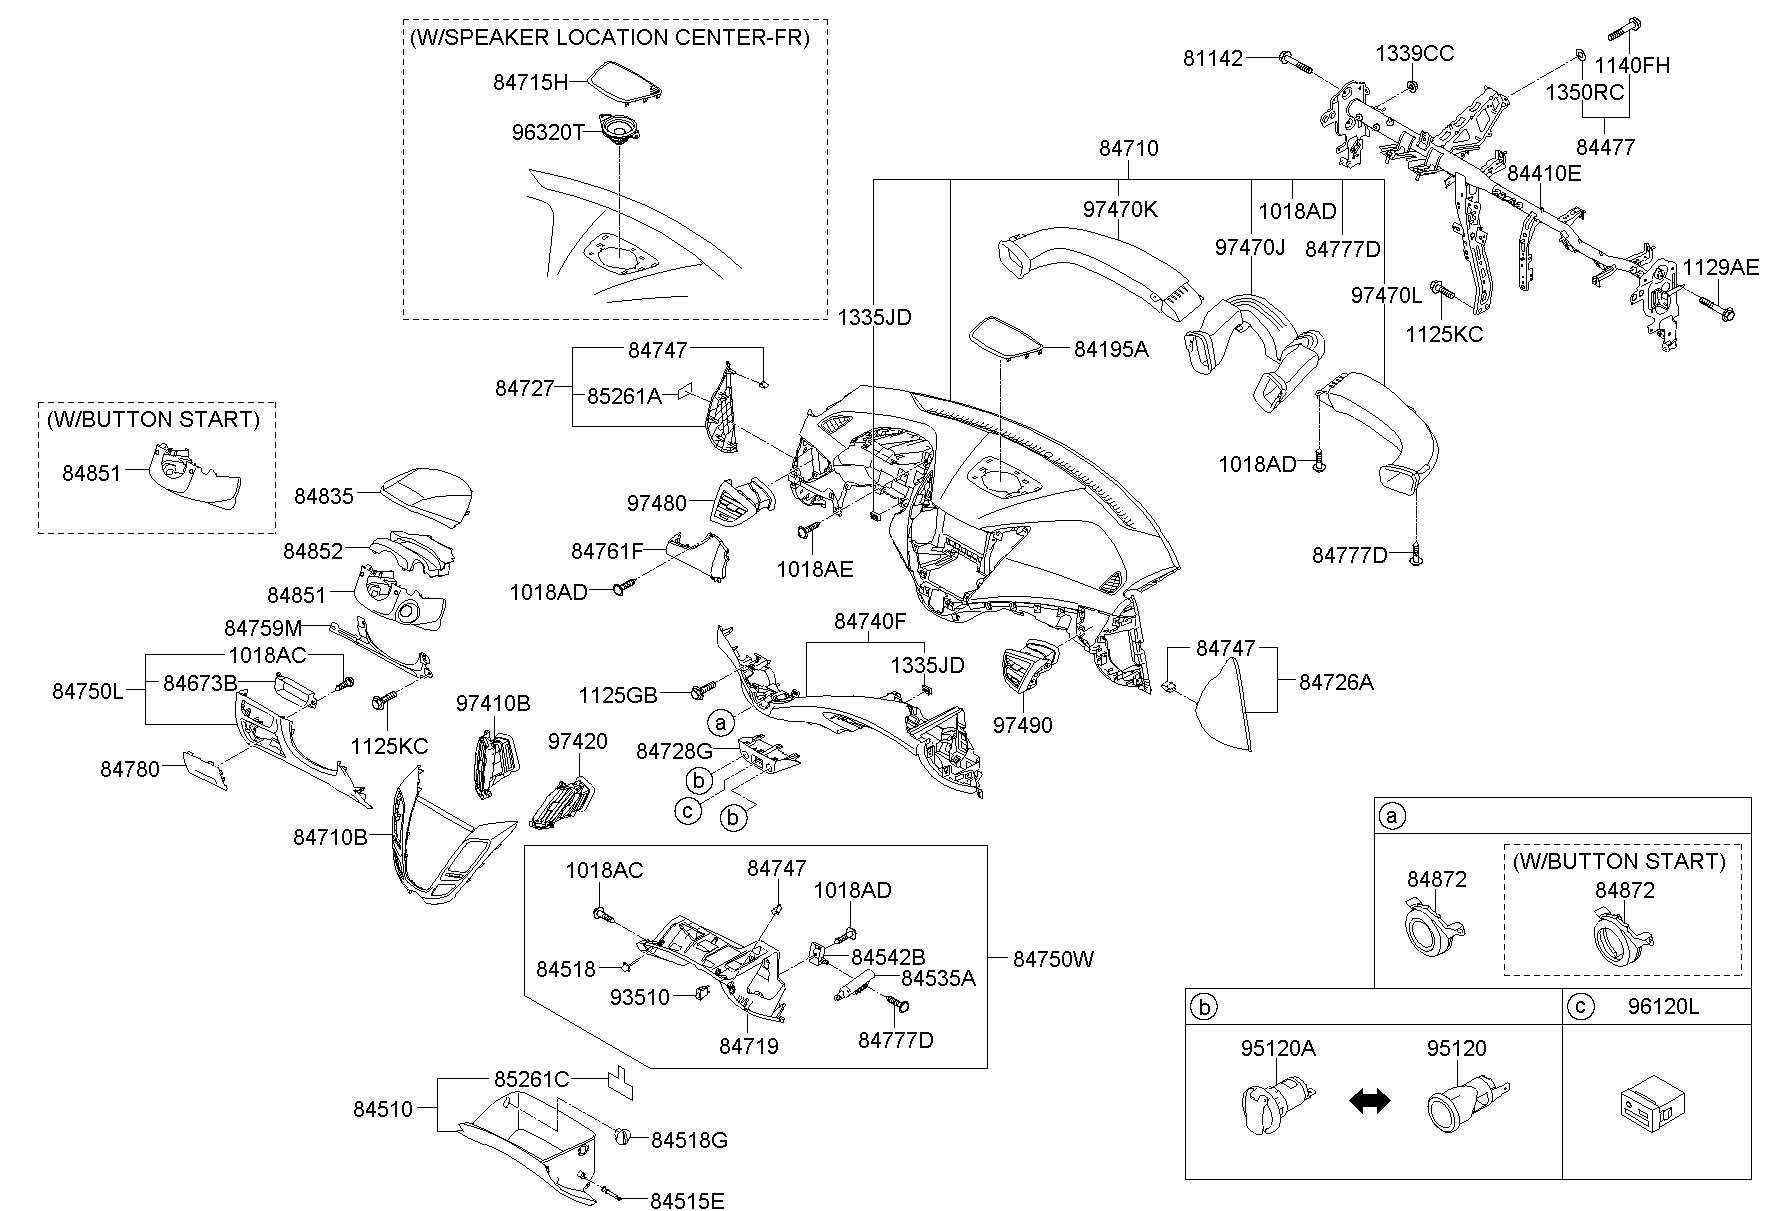 2013 Hyundai Veloster Stereo Wiring Diagram. Hyundai. Auto